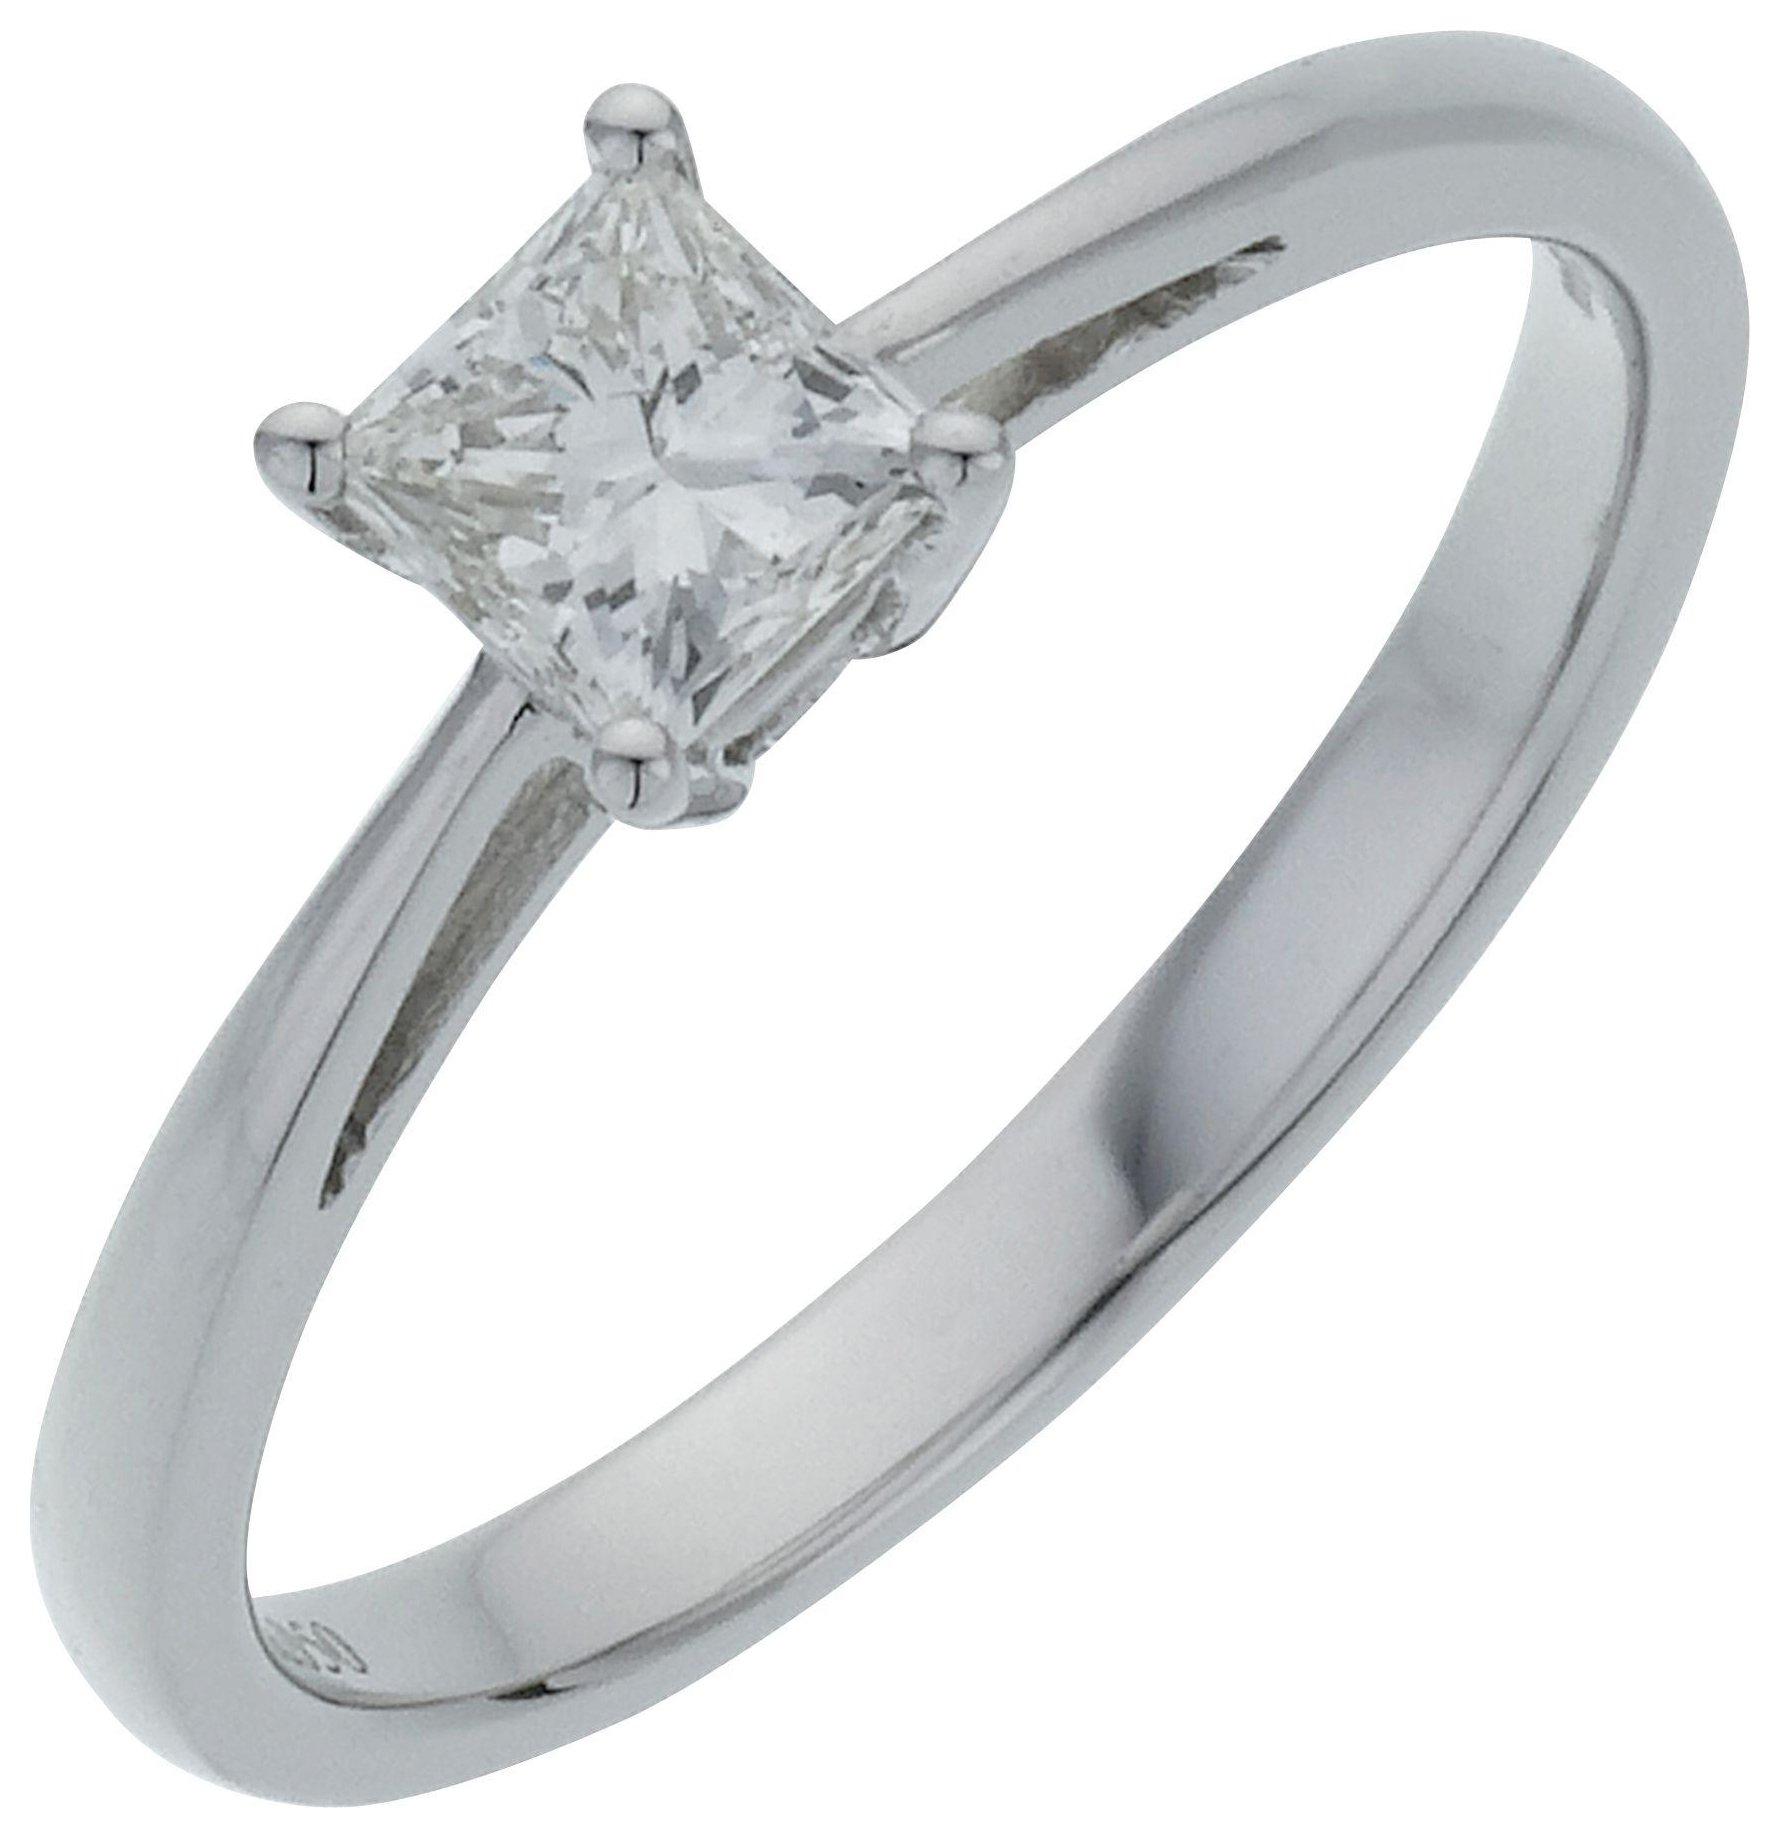 18 Carat White Gold 05 Carat Diamond - Princess Cut Diamond - Ring - T